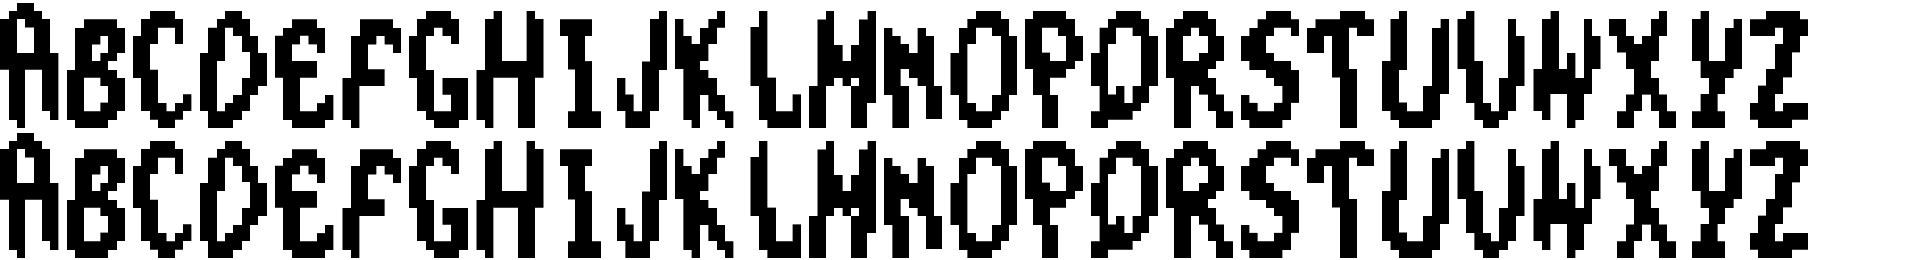 The Smurfs - Large Font